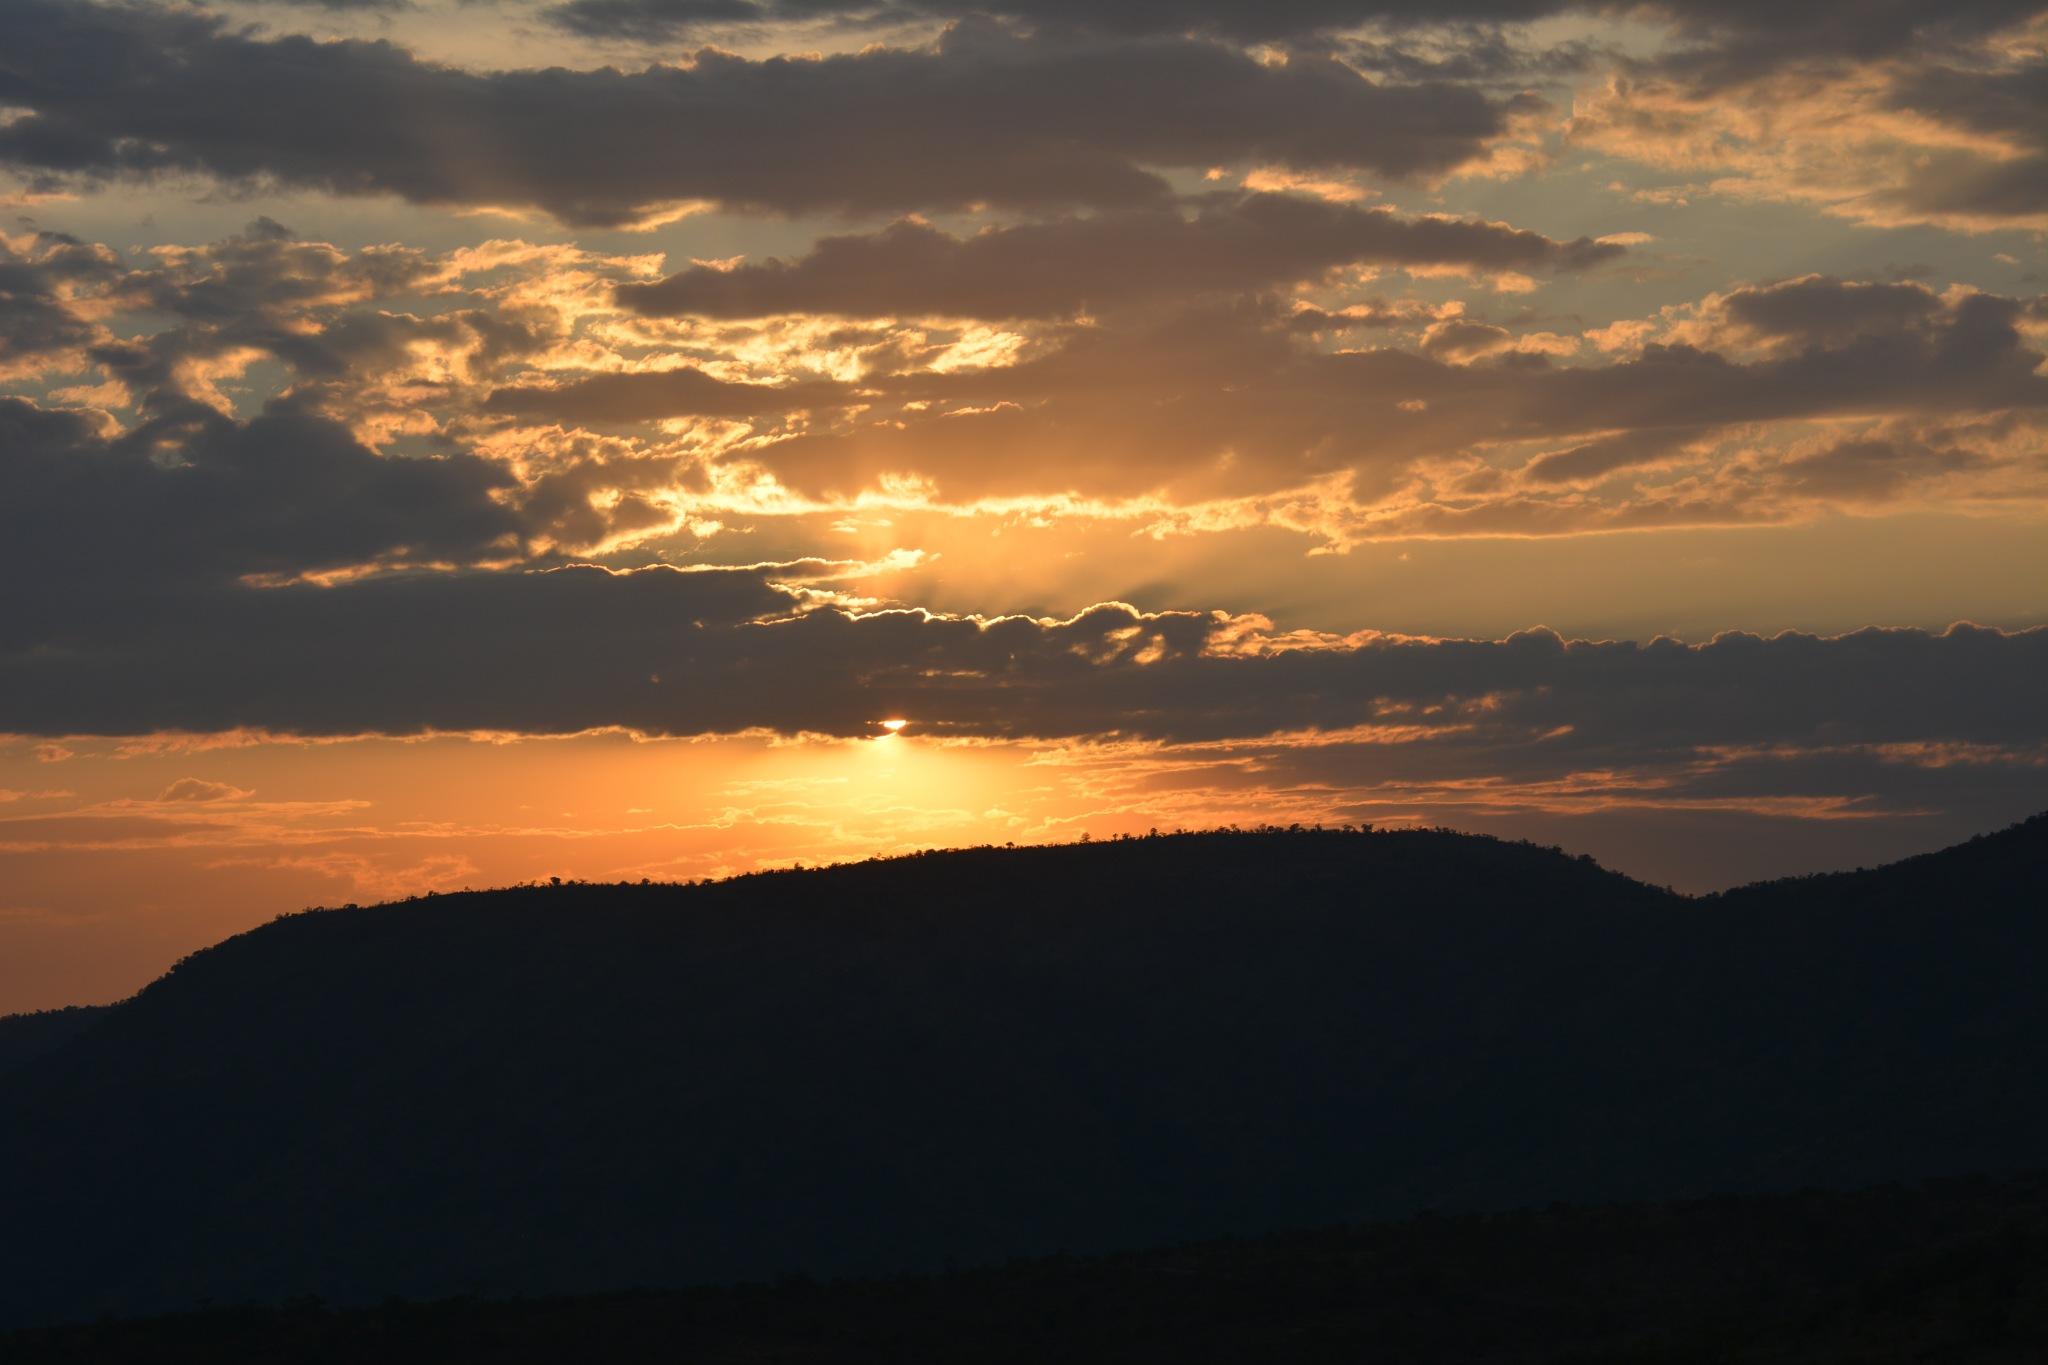 The Sunset in Pilanesburg by RajeshwarPuvvada